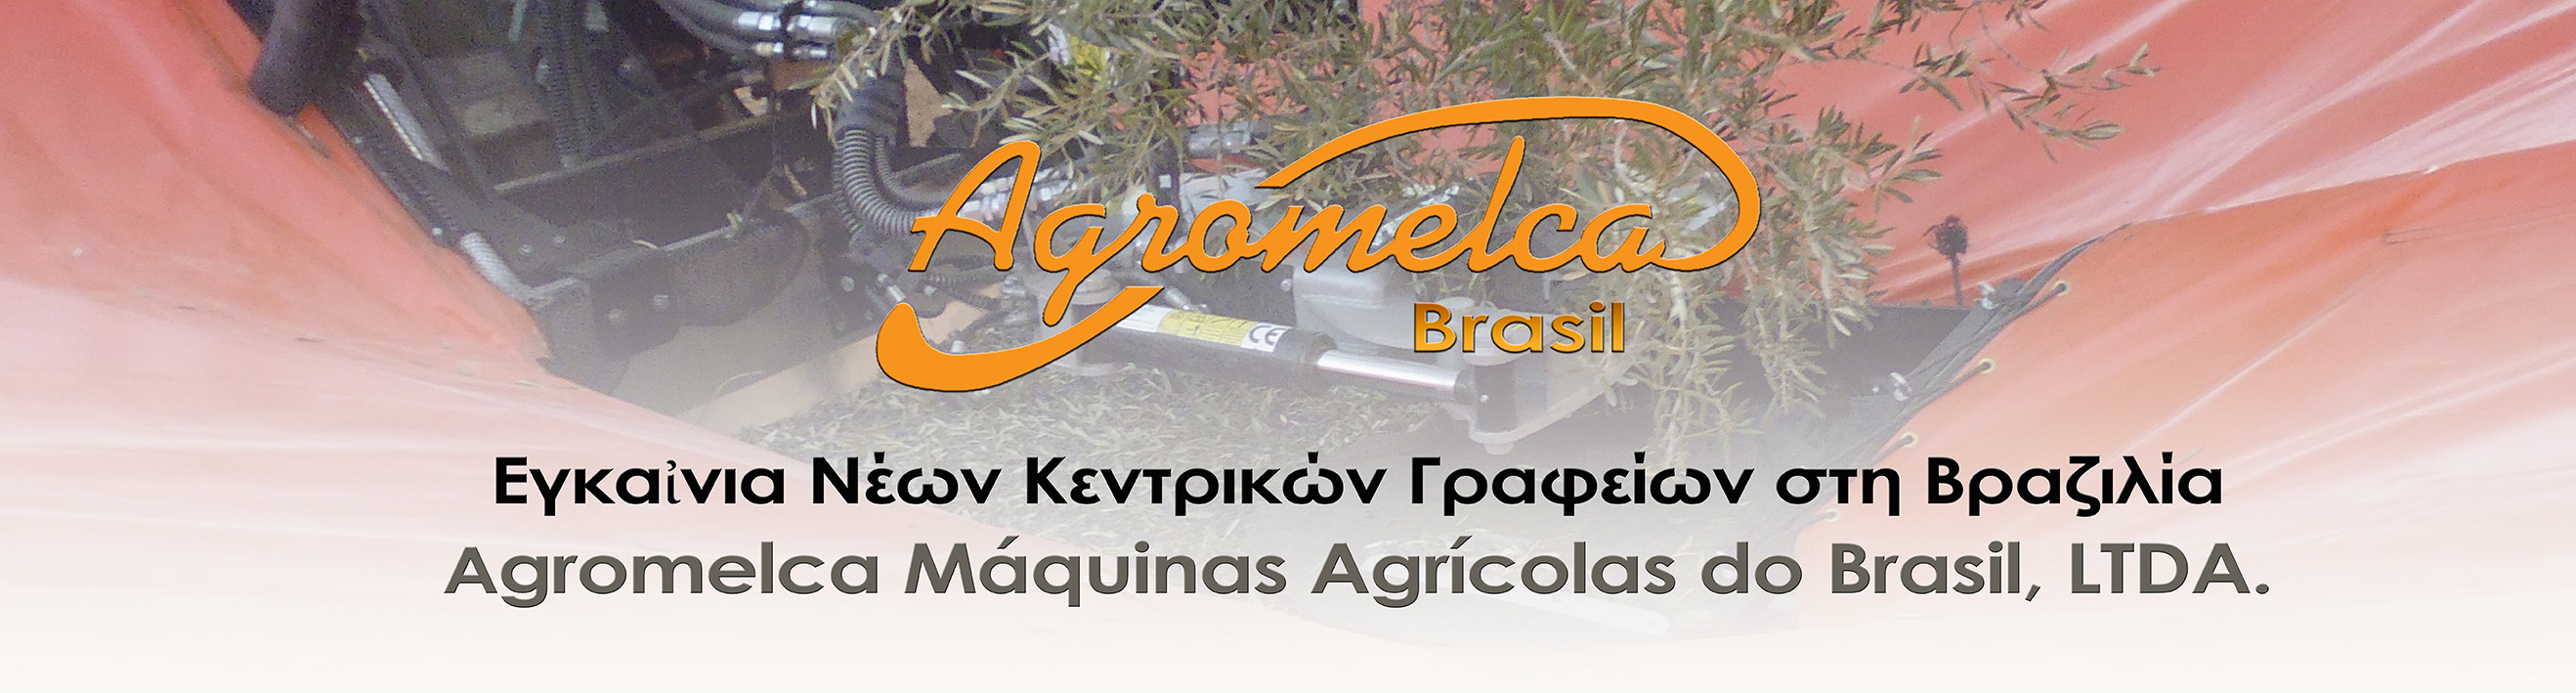 equipos_recolectores_de_aceituna_y_frutos_secos_agromelca_en_brasil_griego-banner